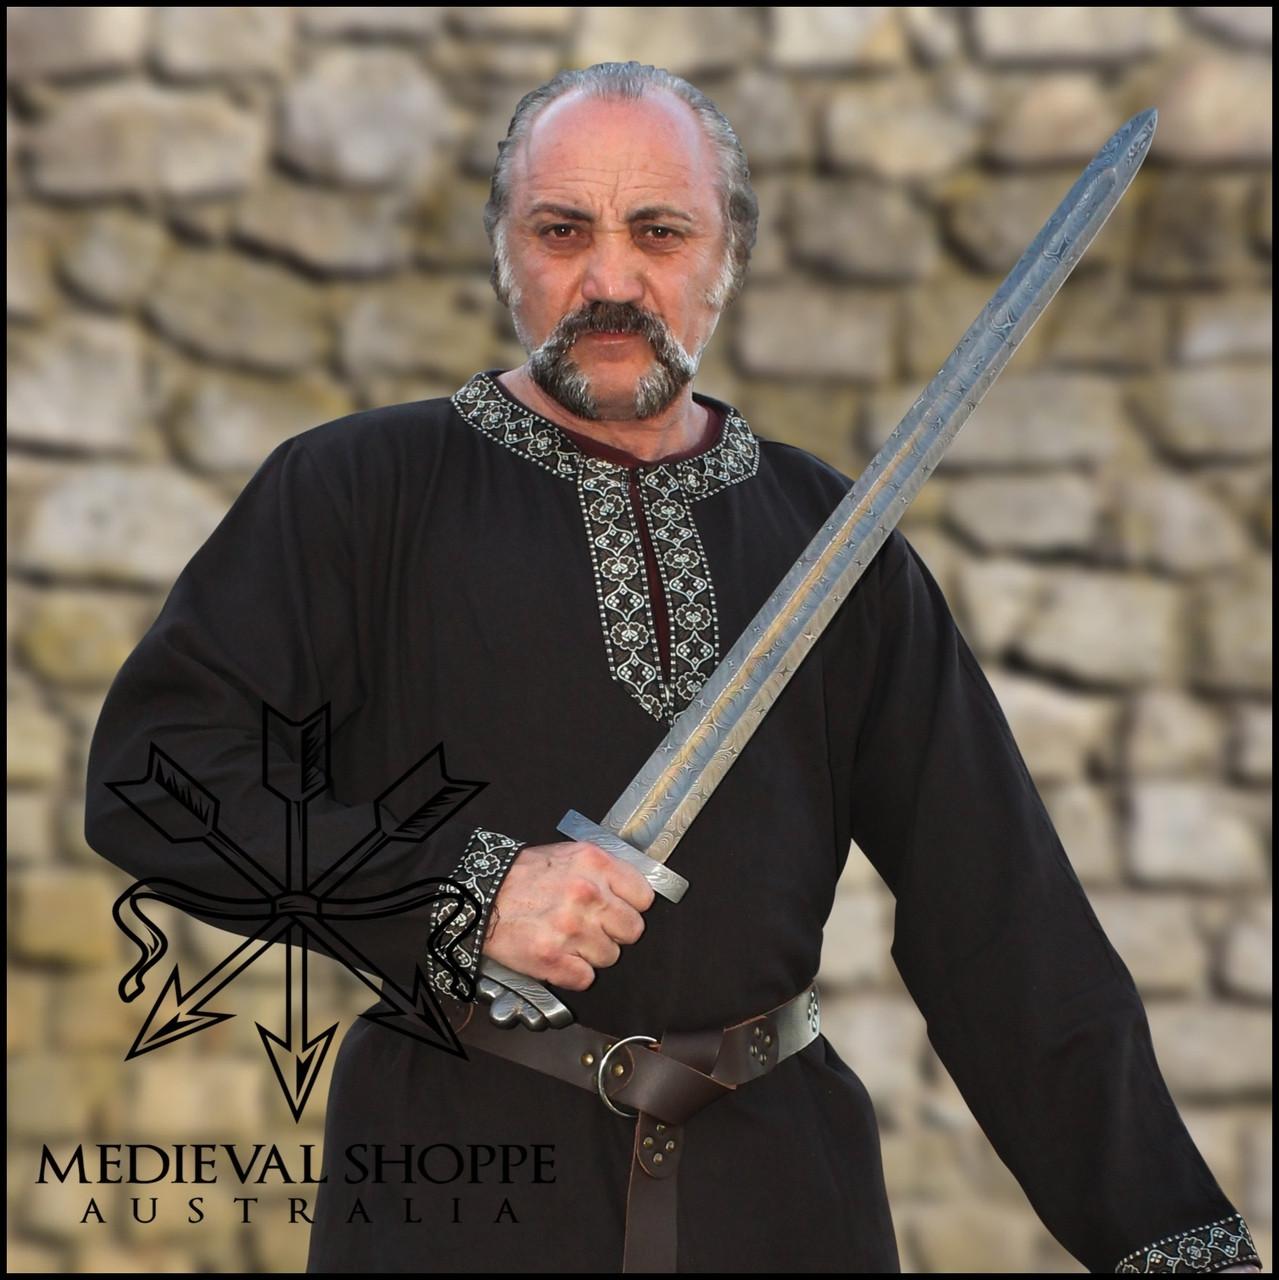 Brown Leather Studded & Segmented Medieval Belt